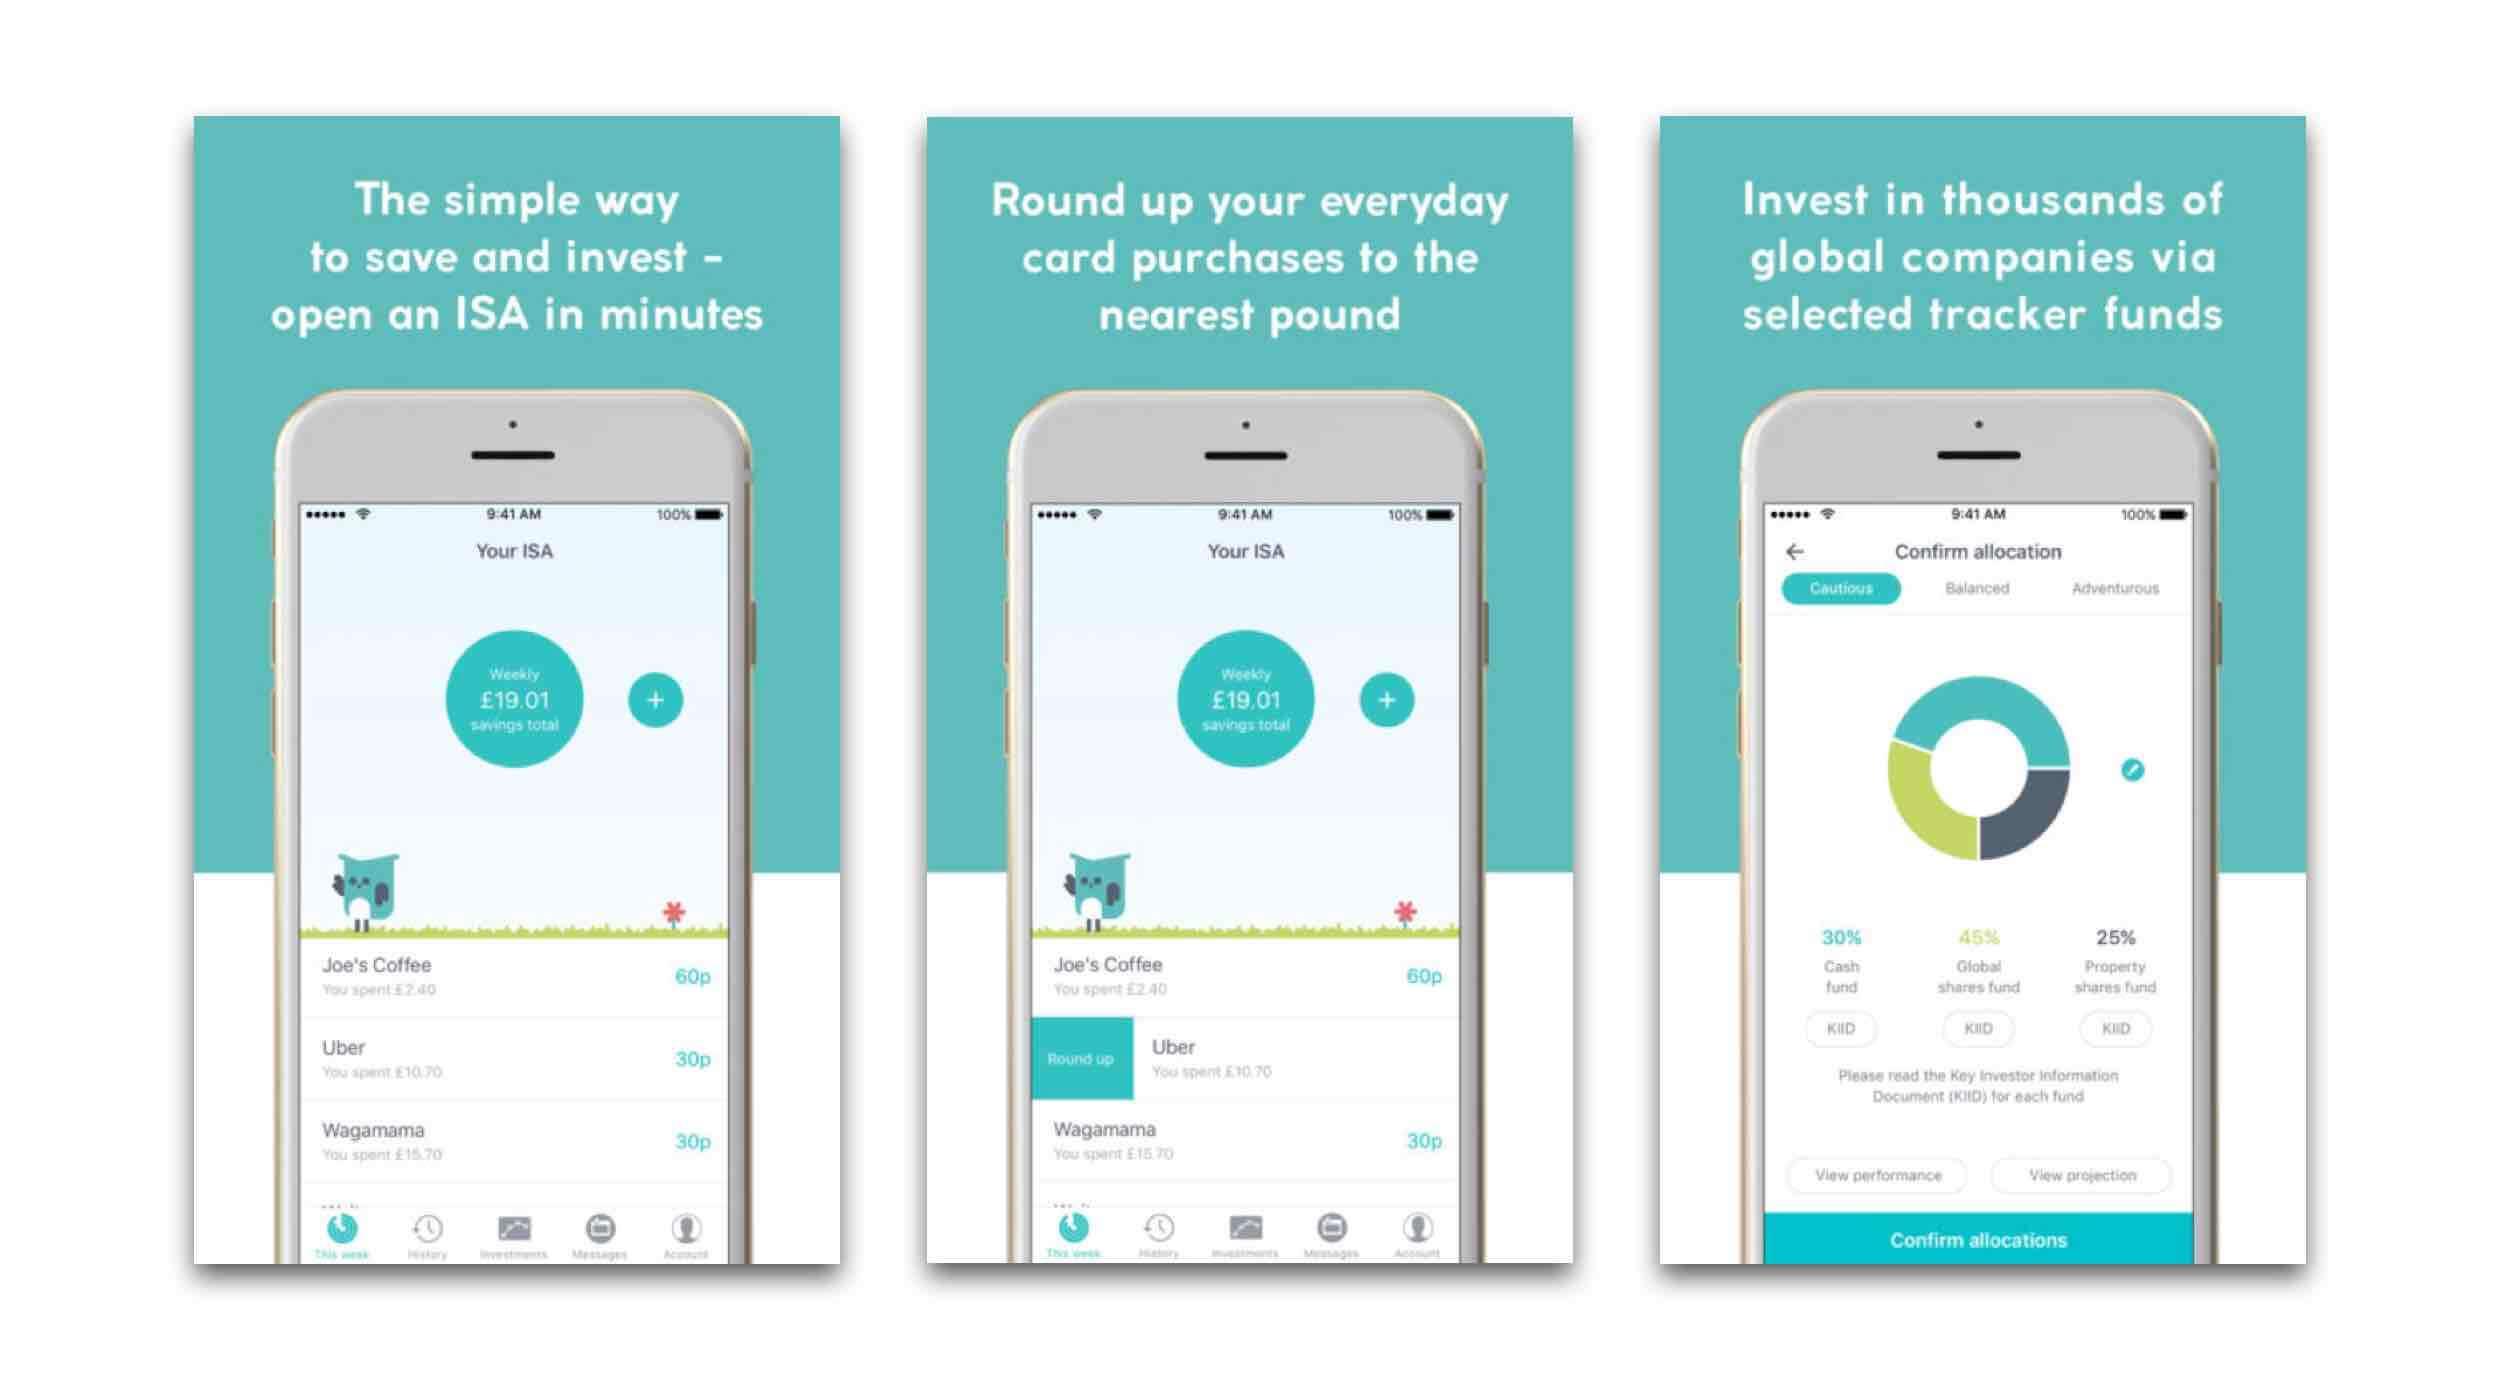 digitális bank starling fintech digitalis bankolas